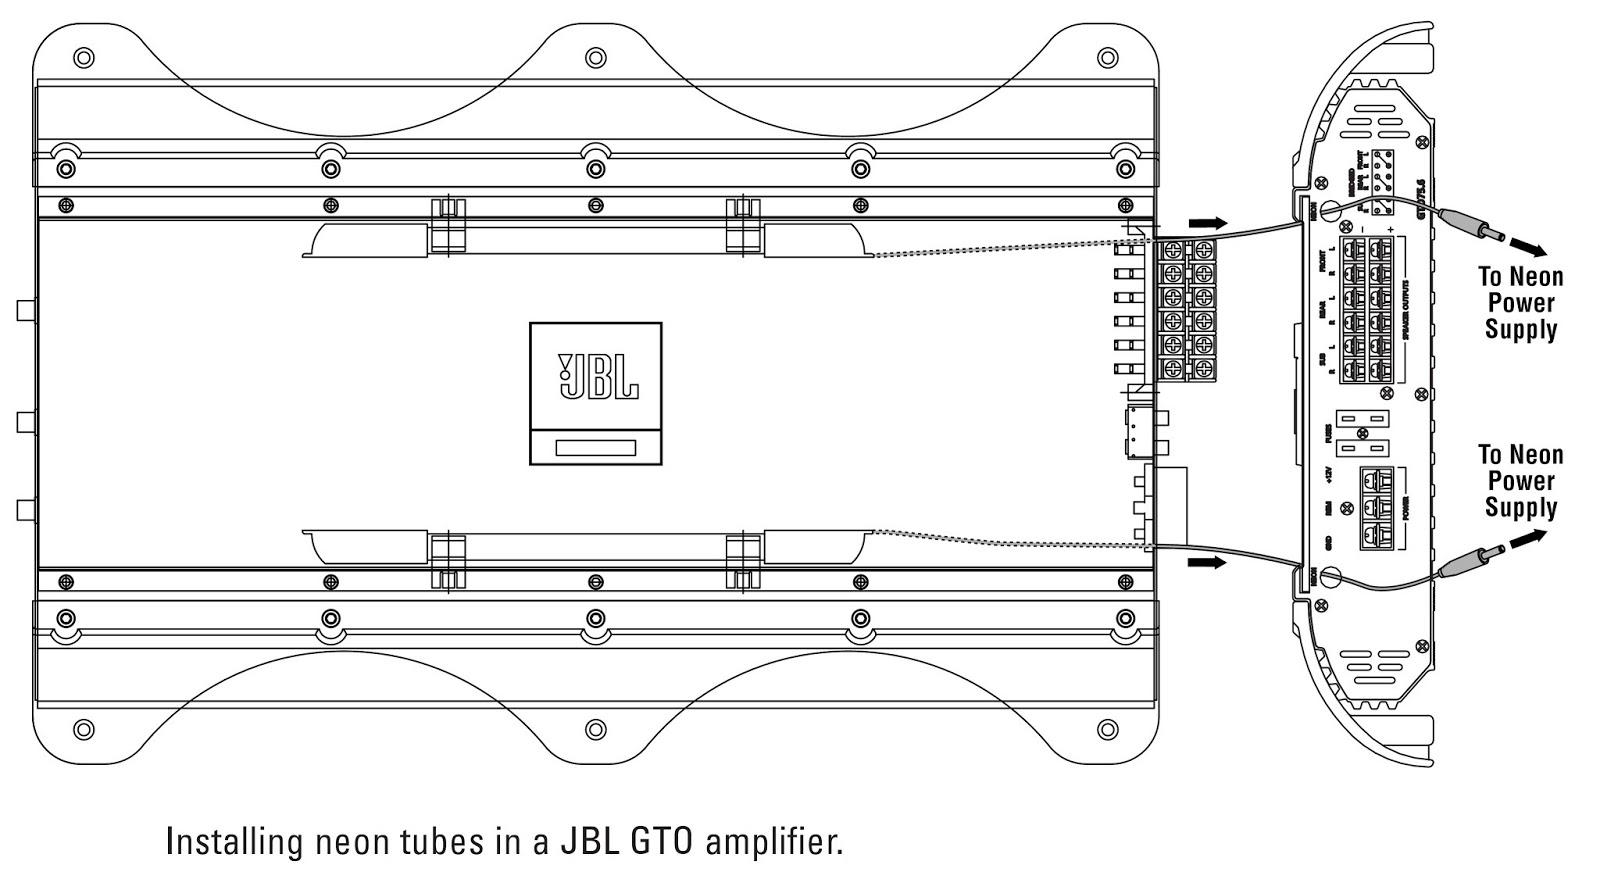 jbl gto301 1 gto601 1 gto1201 1 installation wiring rh electronicshelponline blogspot com 1966 GTO Wiring-Diagram 1965 GTO Wiring-Diagram